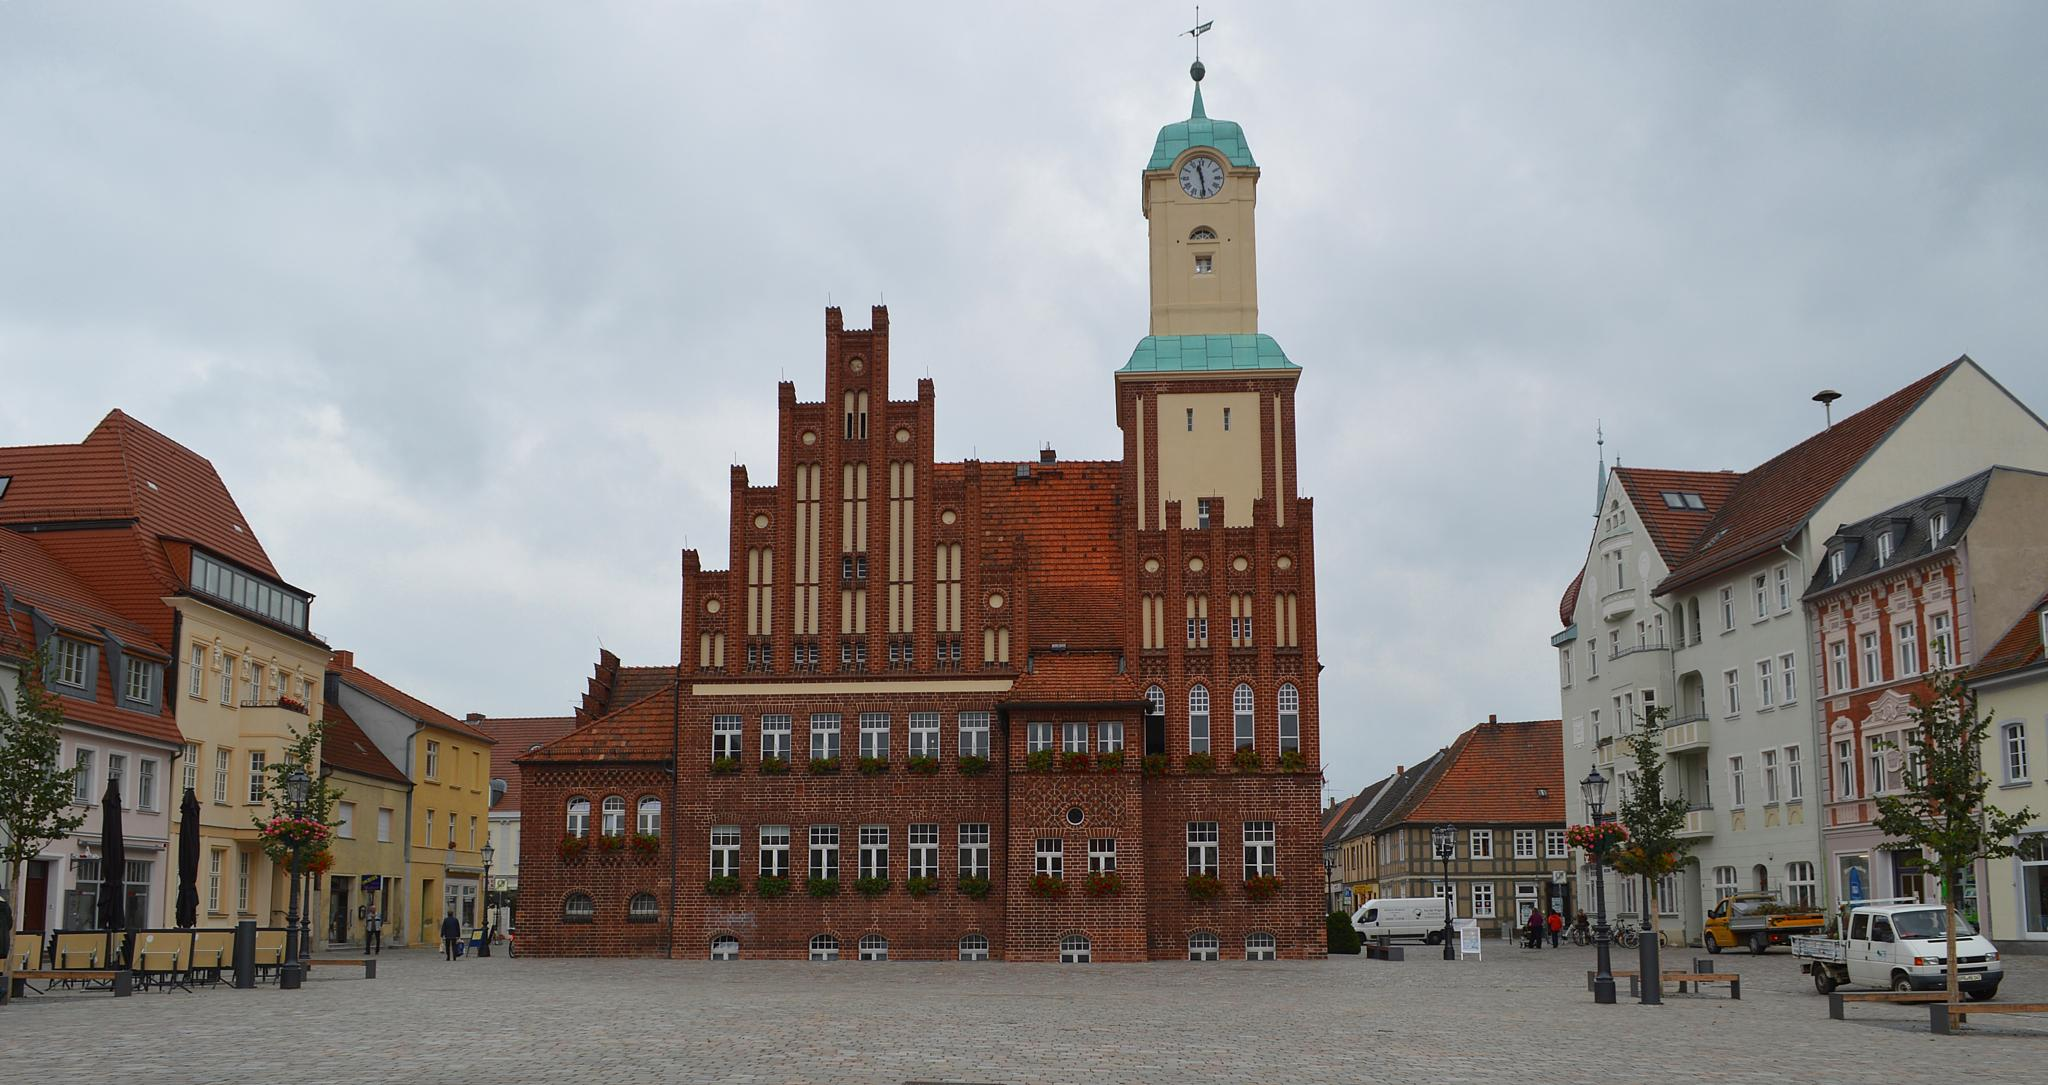 Marktplatz Wittstock by elvira.ludwigs1